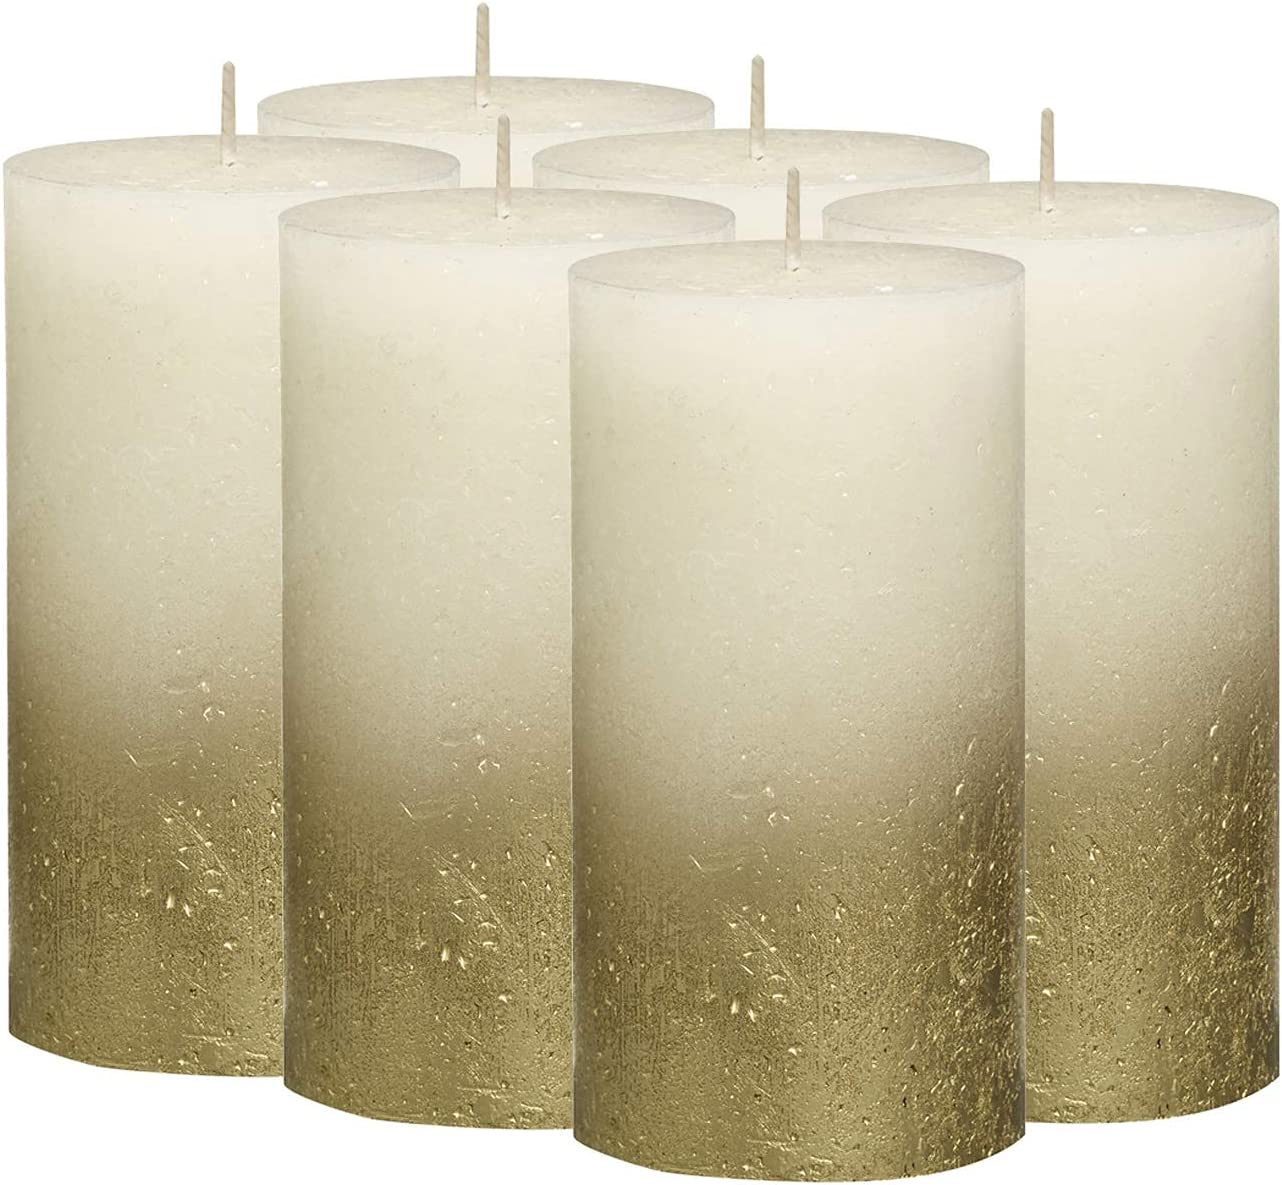 New sales Regular dealer Bolsius Fading Metallic Set of 6 Pillar Candles 2.75 X Unscented